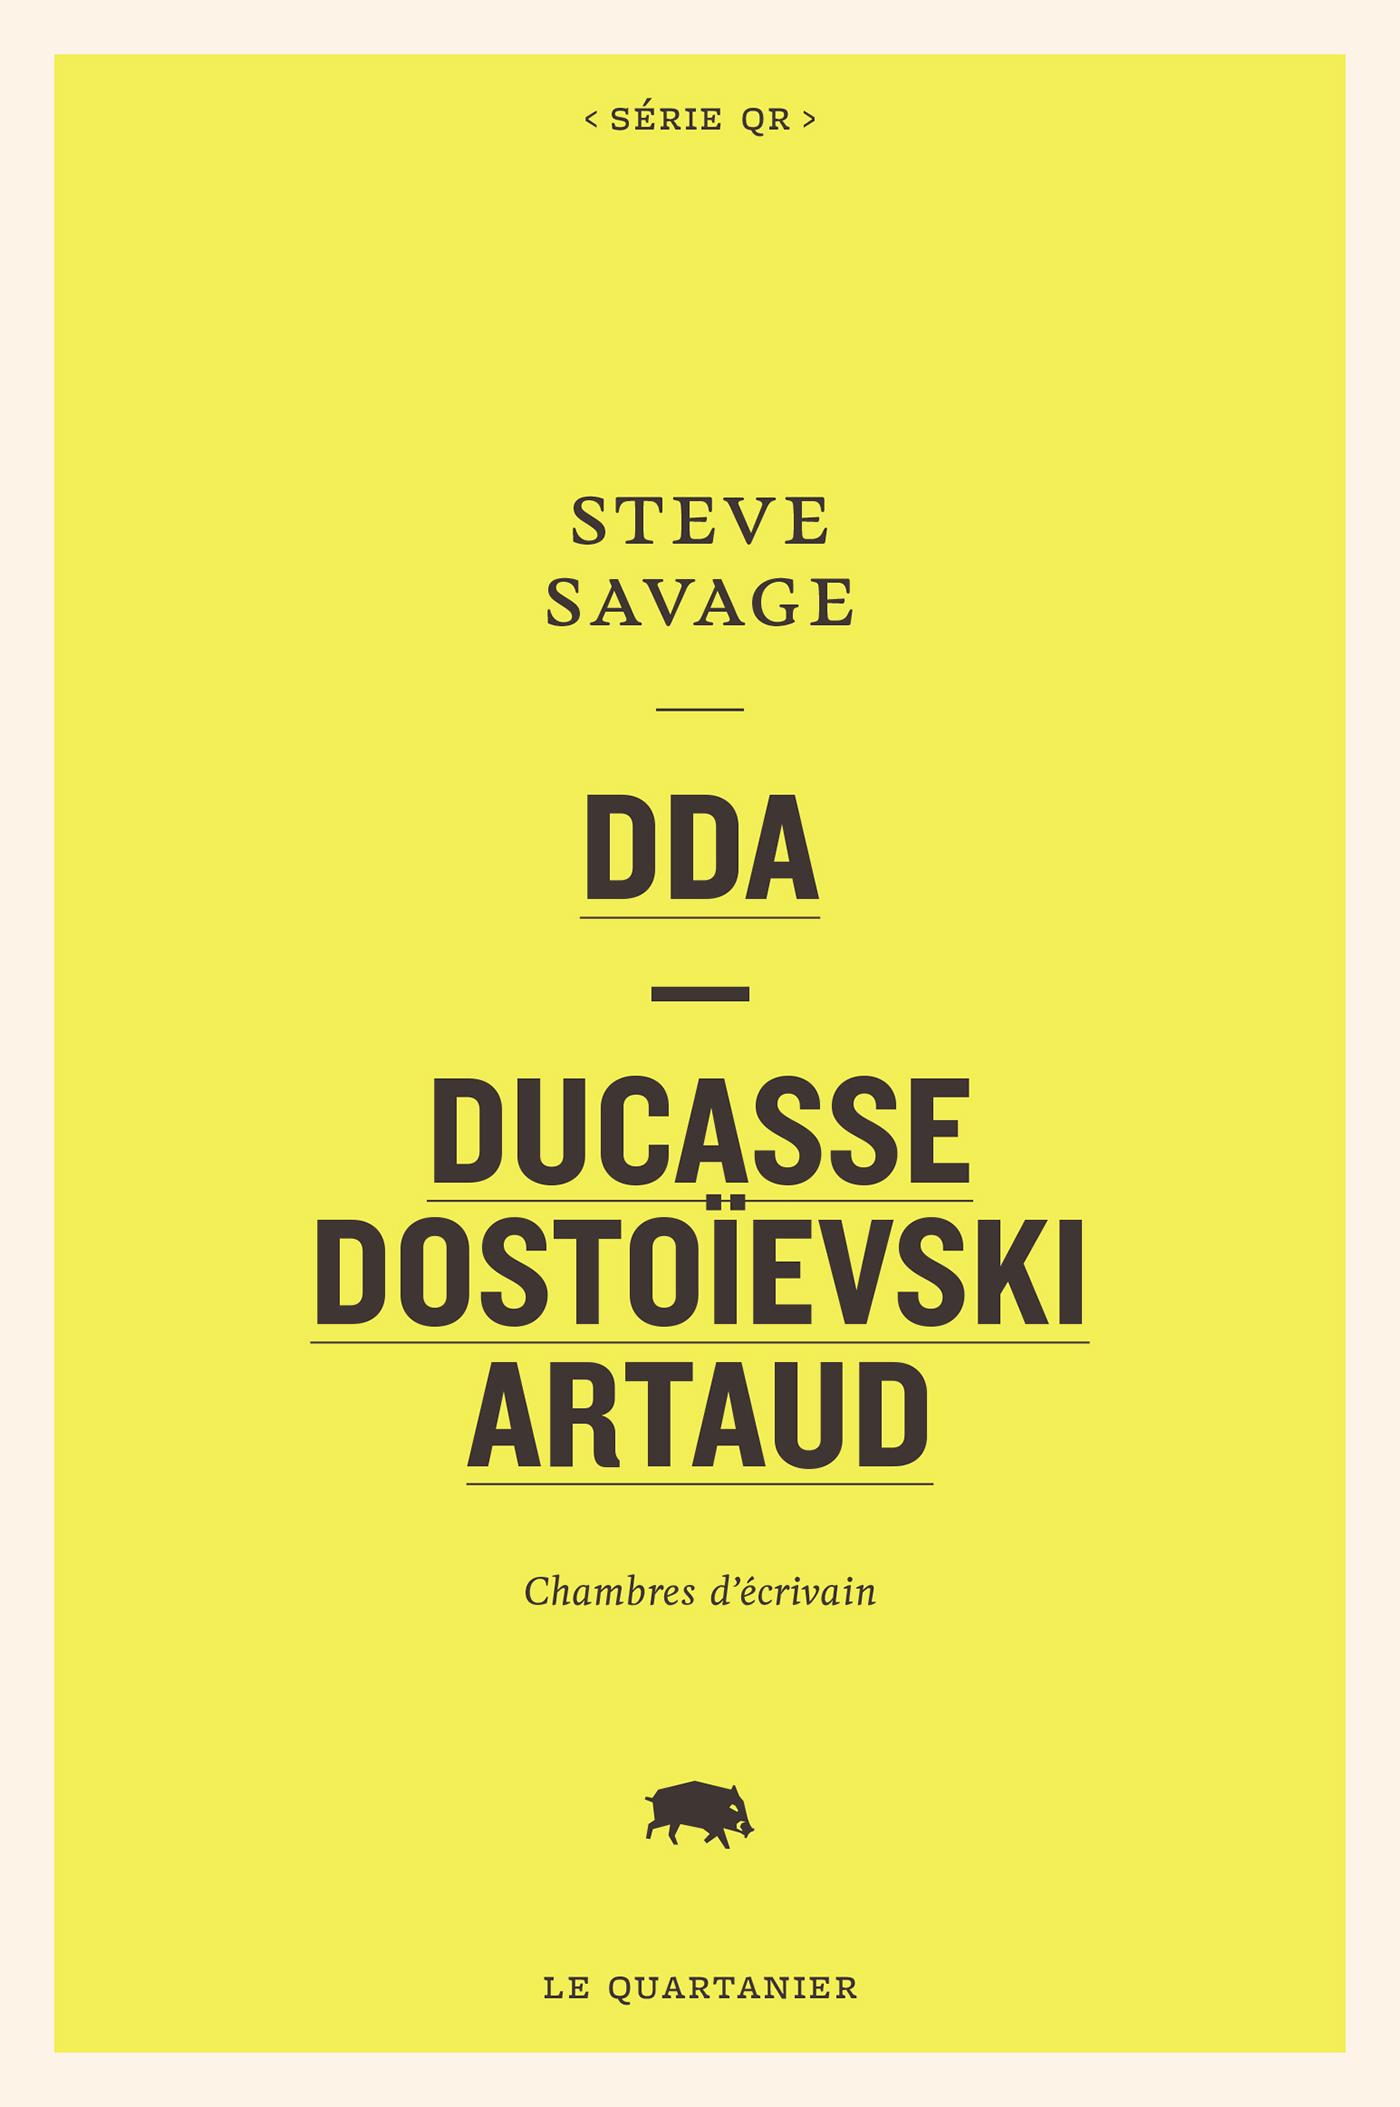 DDA — Ducasse, Dostoïevski, Artaud